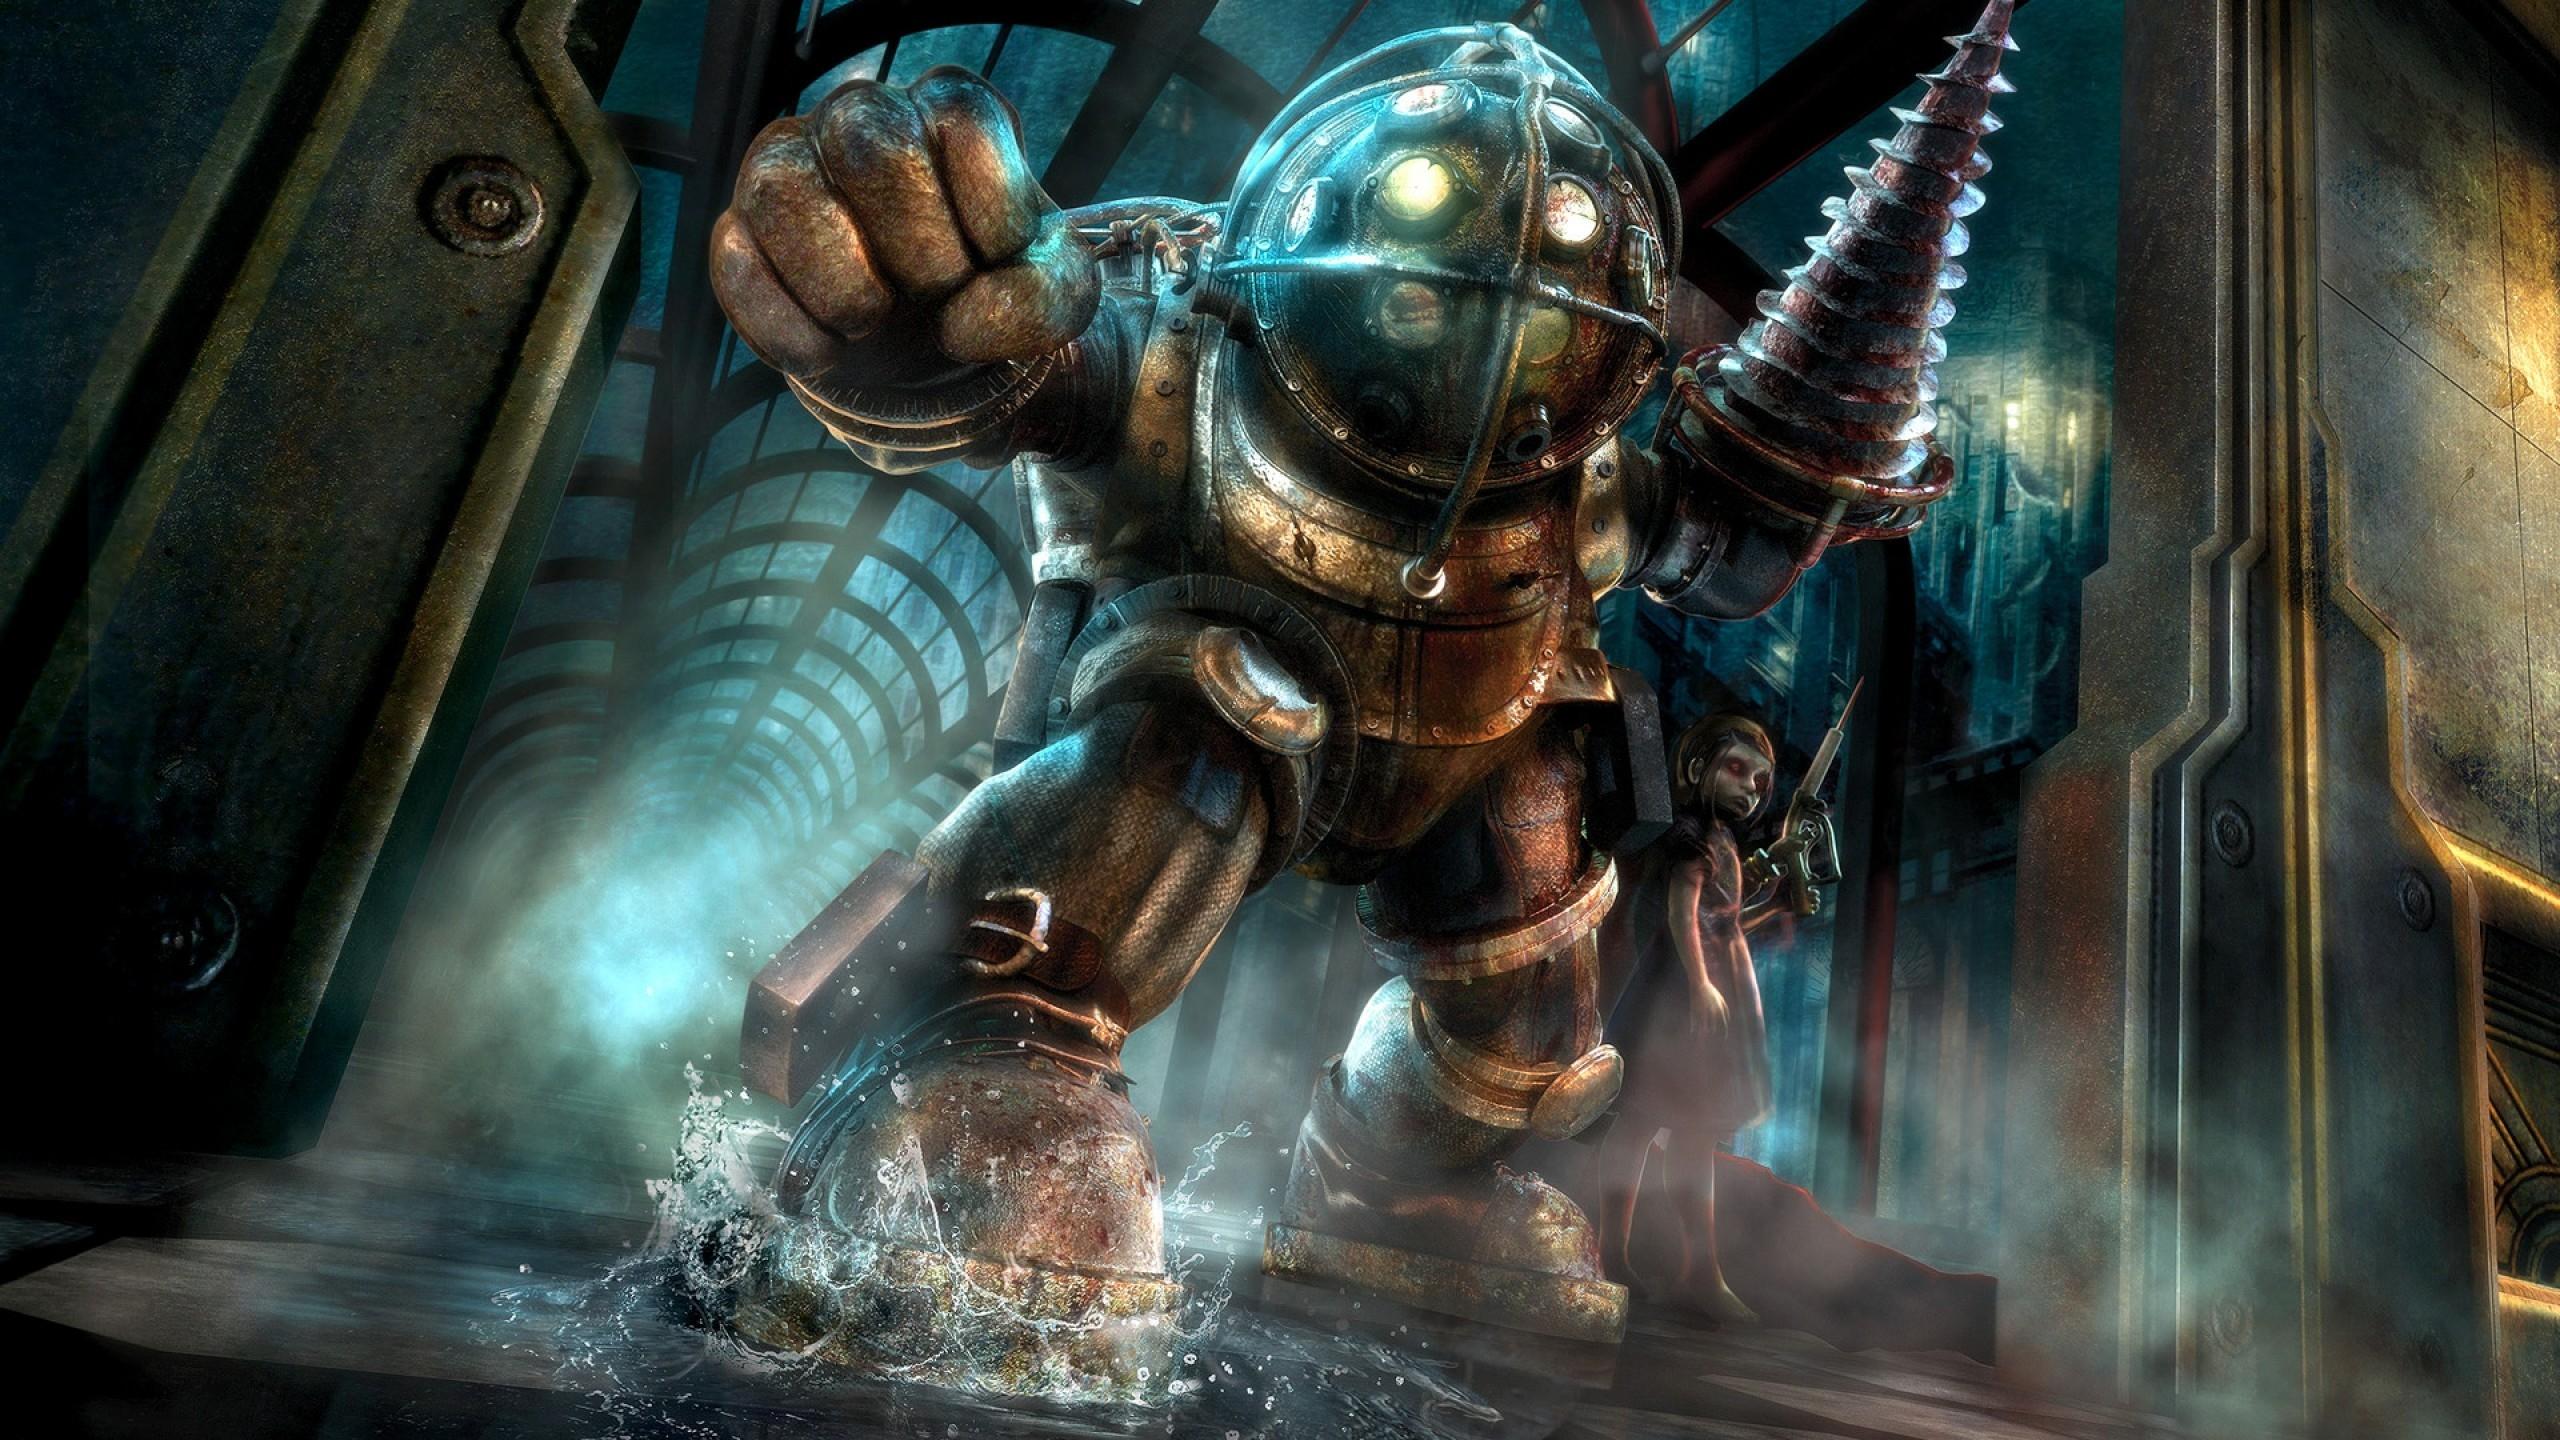 Wallpaper Big Daddy Bioshock Mythology Little Sister